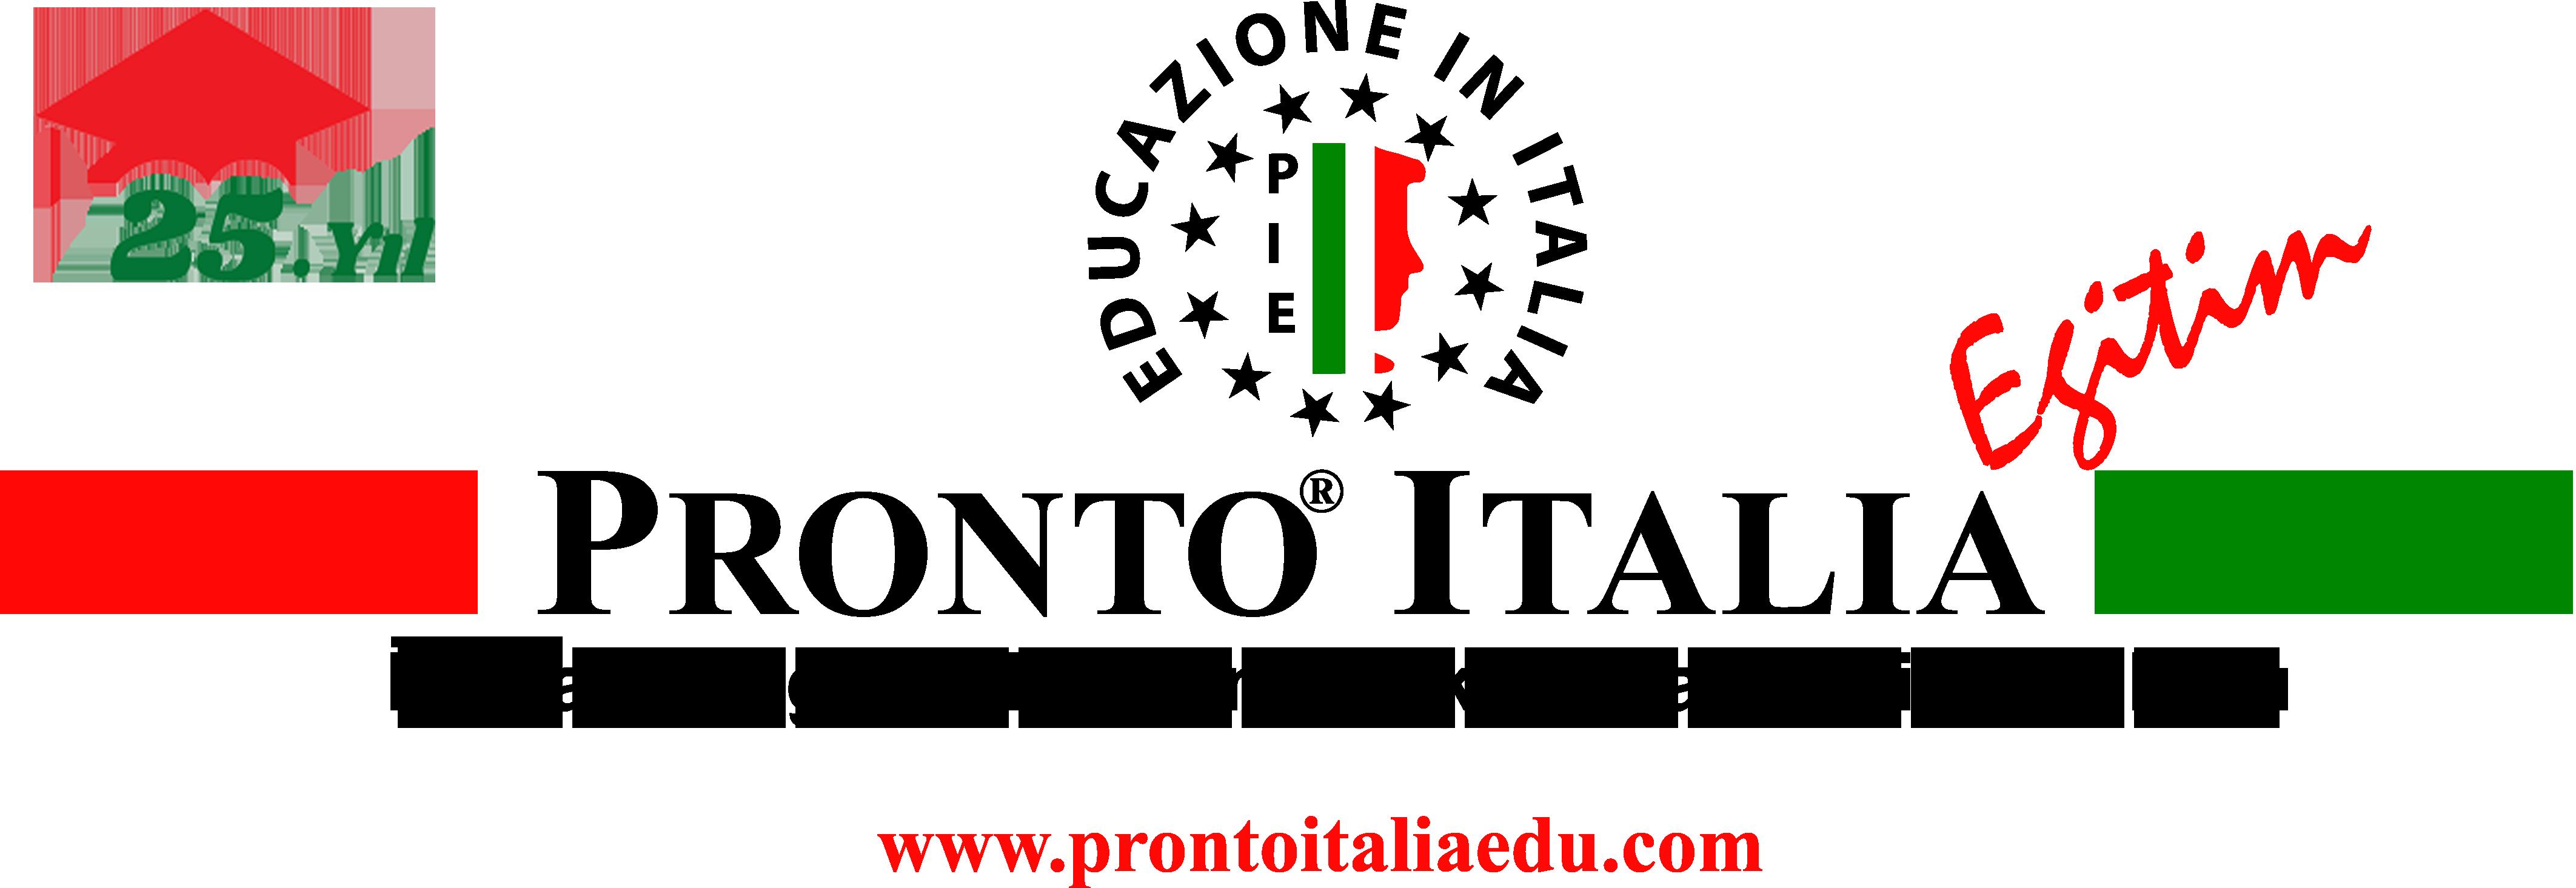 Prontoitalia Eğitim